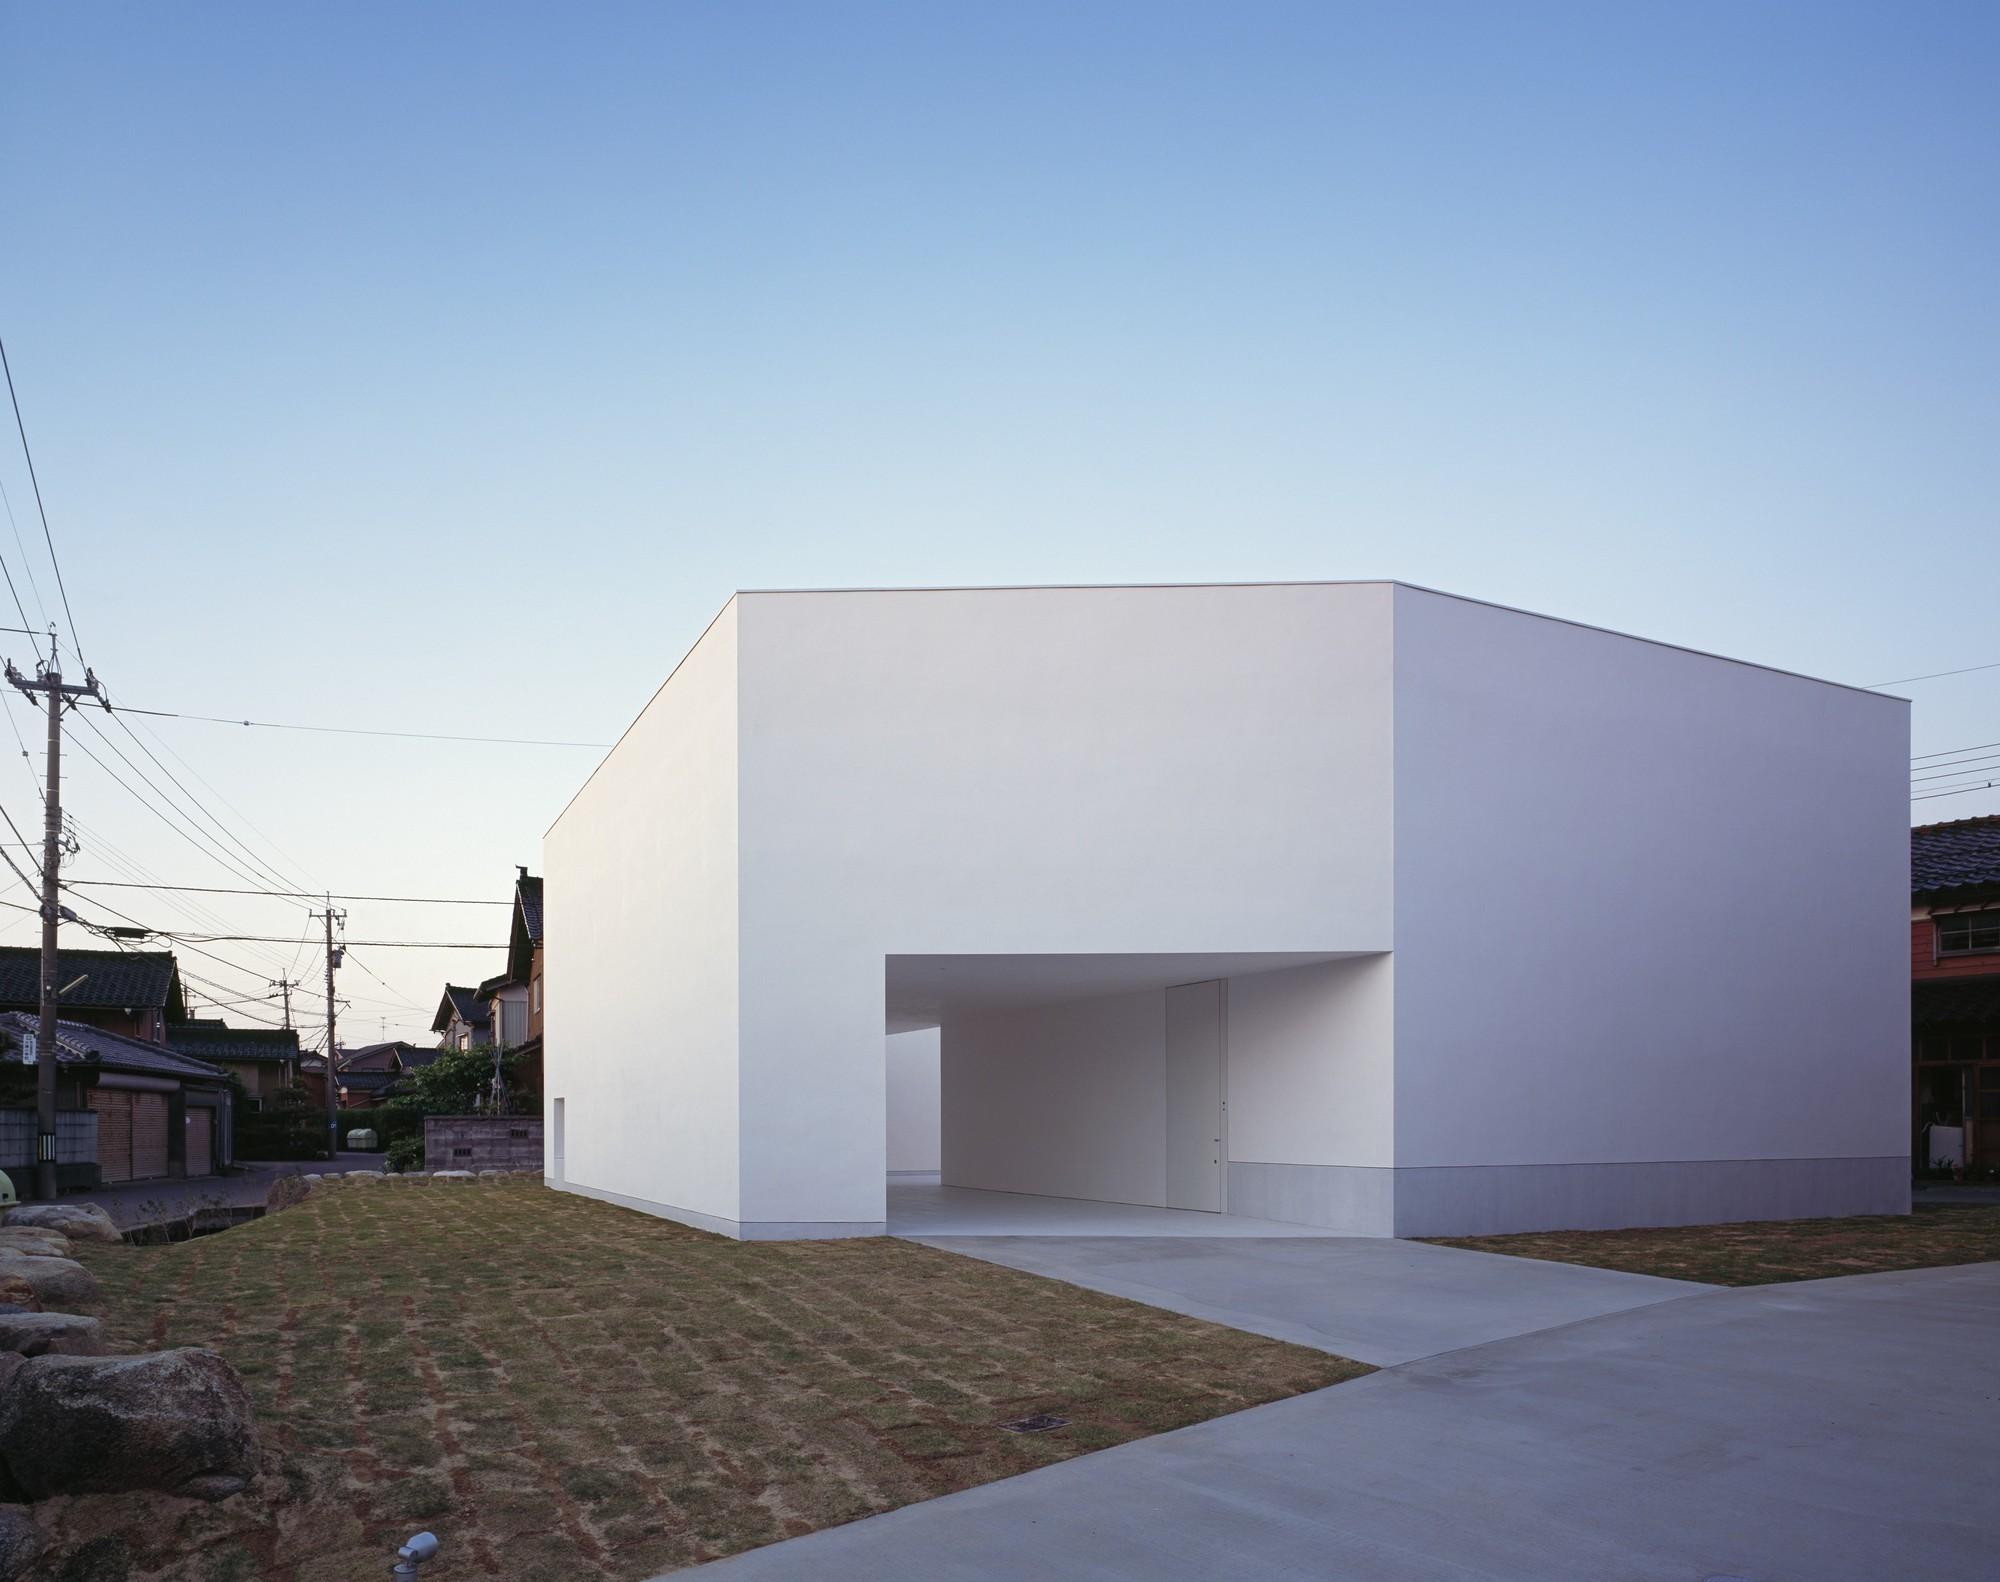 White Cave House / Takuro Yamamoto Architects, Courtesy of Takuro Yamamoto Architects